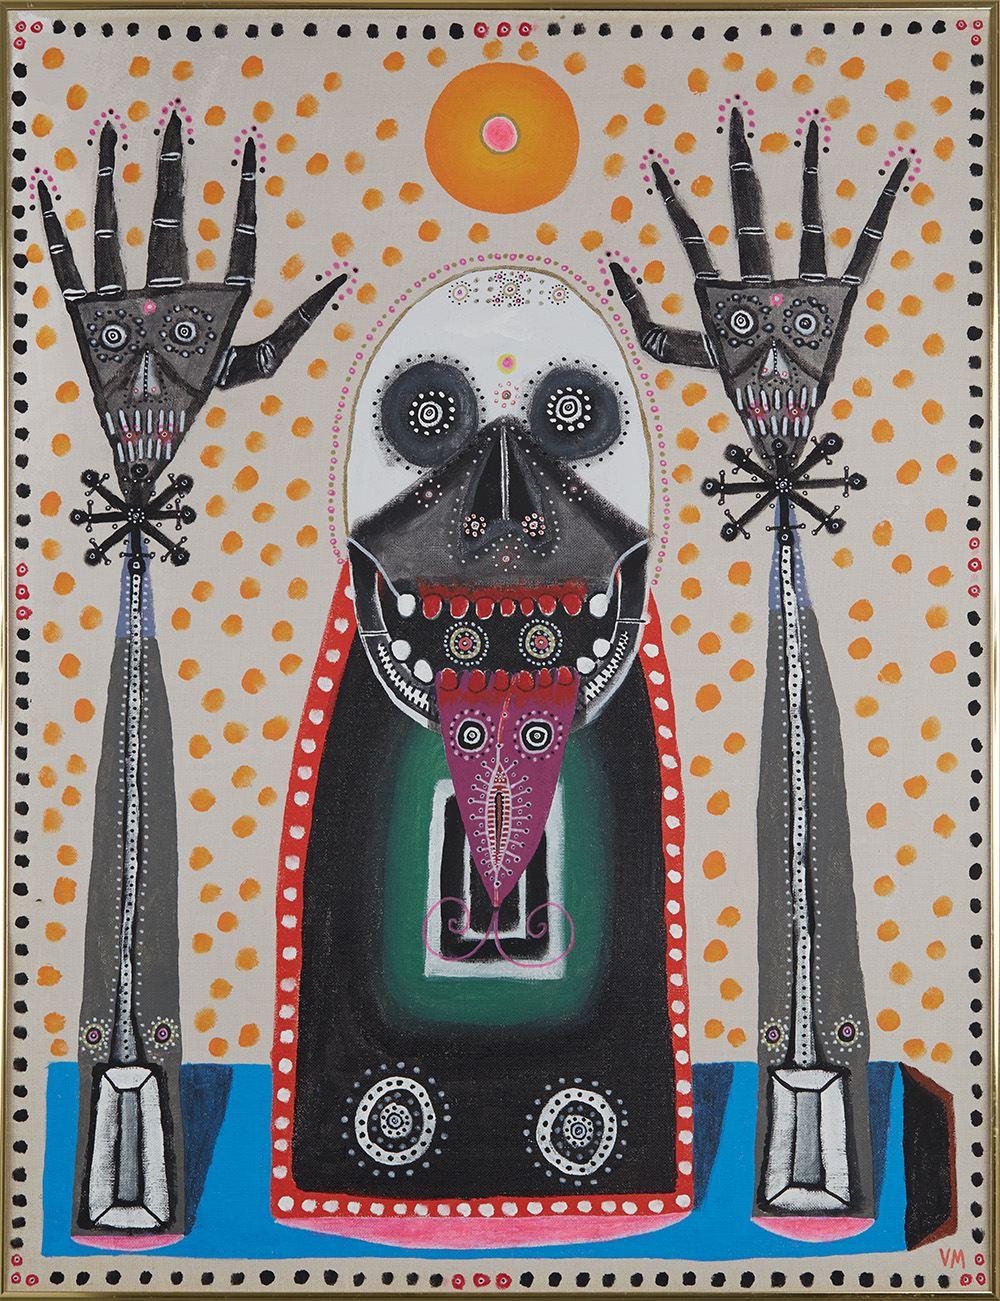 Gregory Van Maanen,Untitled, 11/7/2016, Acrylic on canvas, 35 x 27 inches, 88.9 x 68.6 cm, GVM 2570